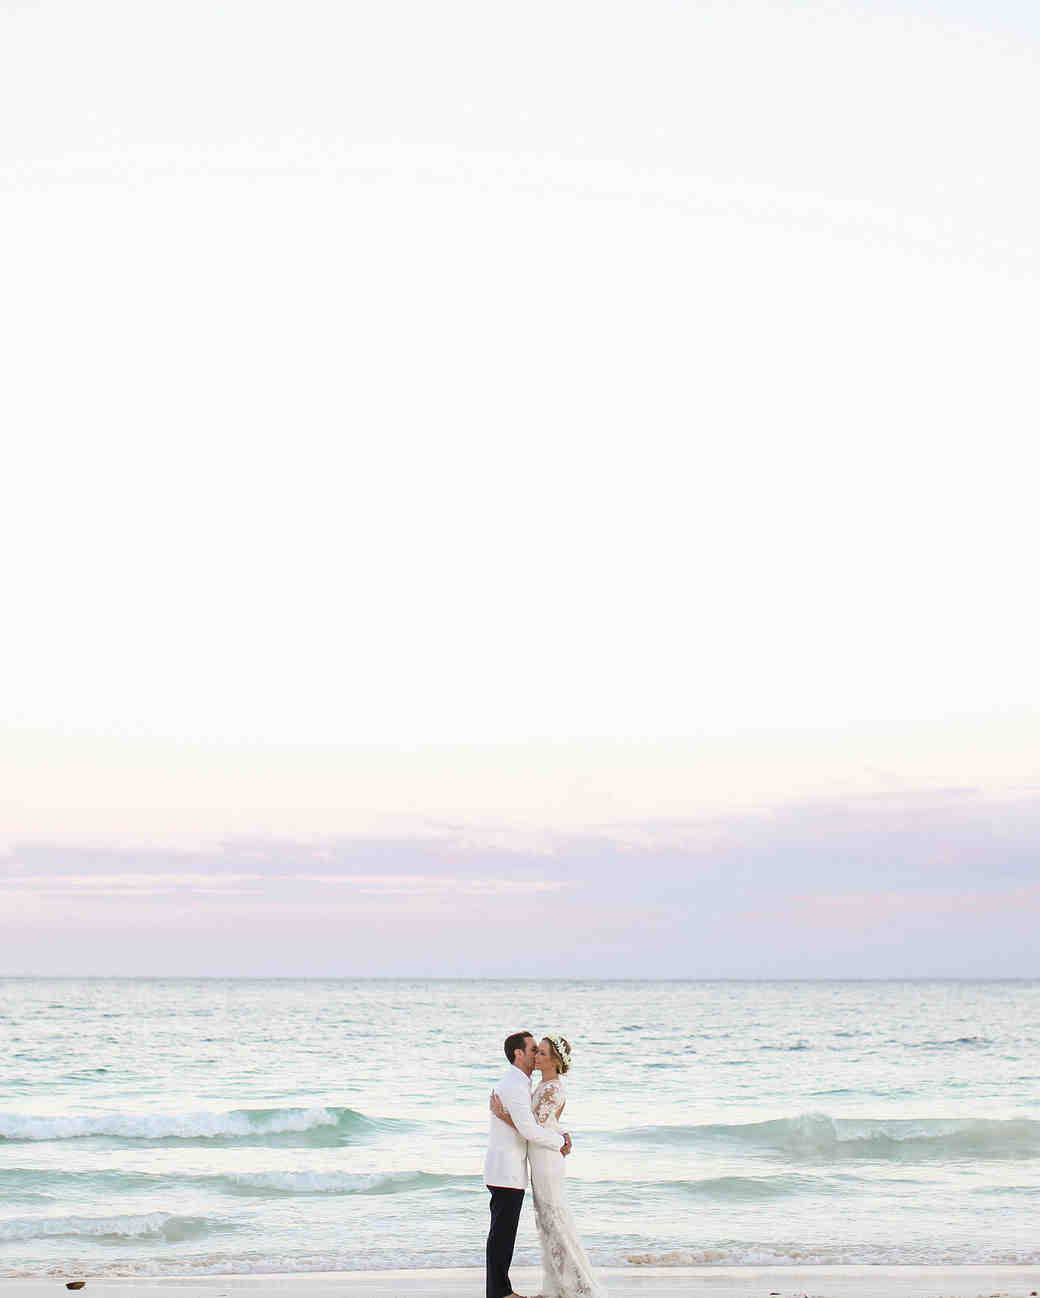 olivia-keith-wedding-couple-34-s112304-0815.jpg